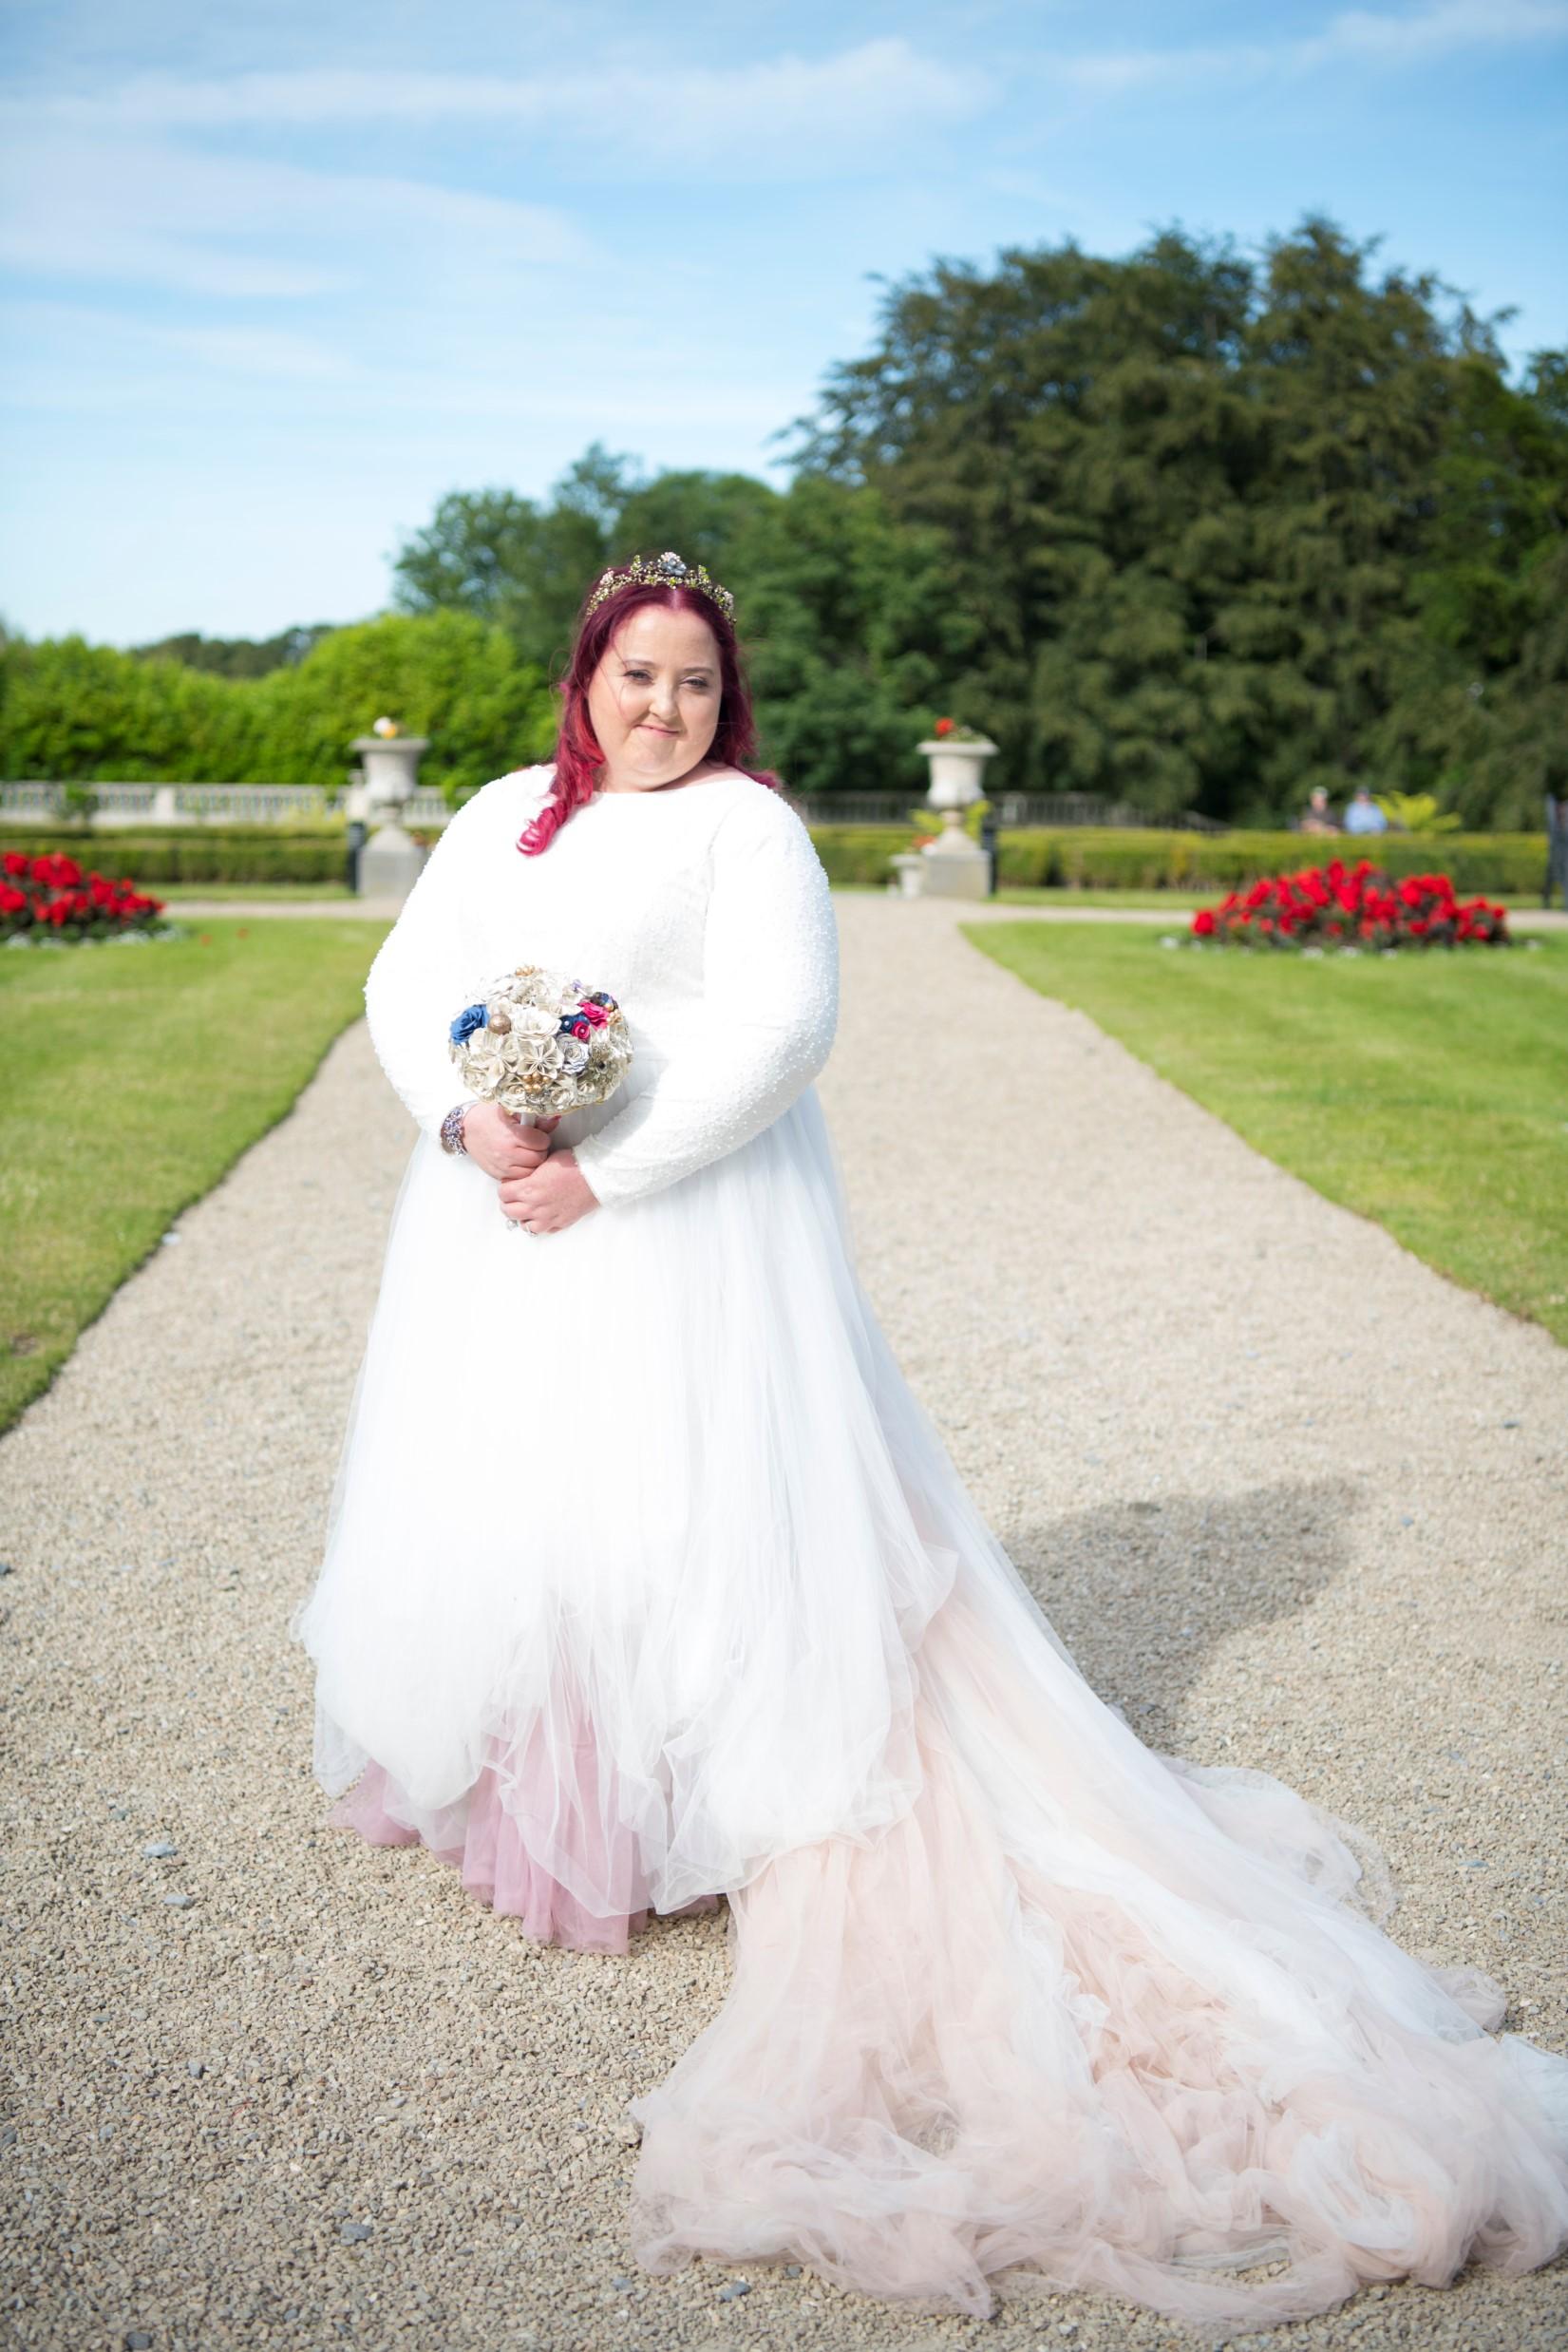 Zoo Wedding- Emma May Photography- Unconventional Wedding- Unique Wedding Inspiration- Pink Wedding Dress